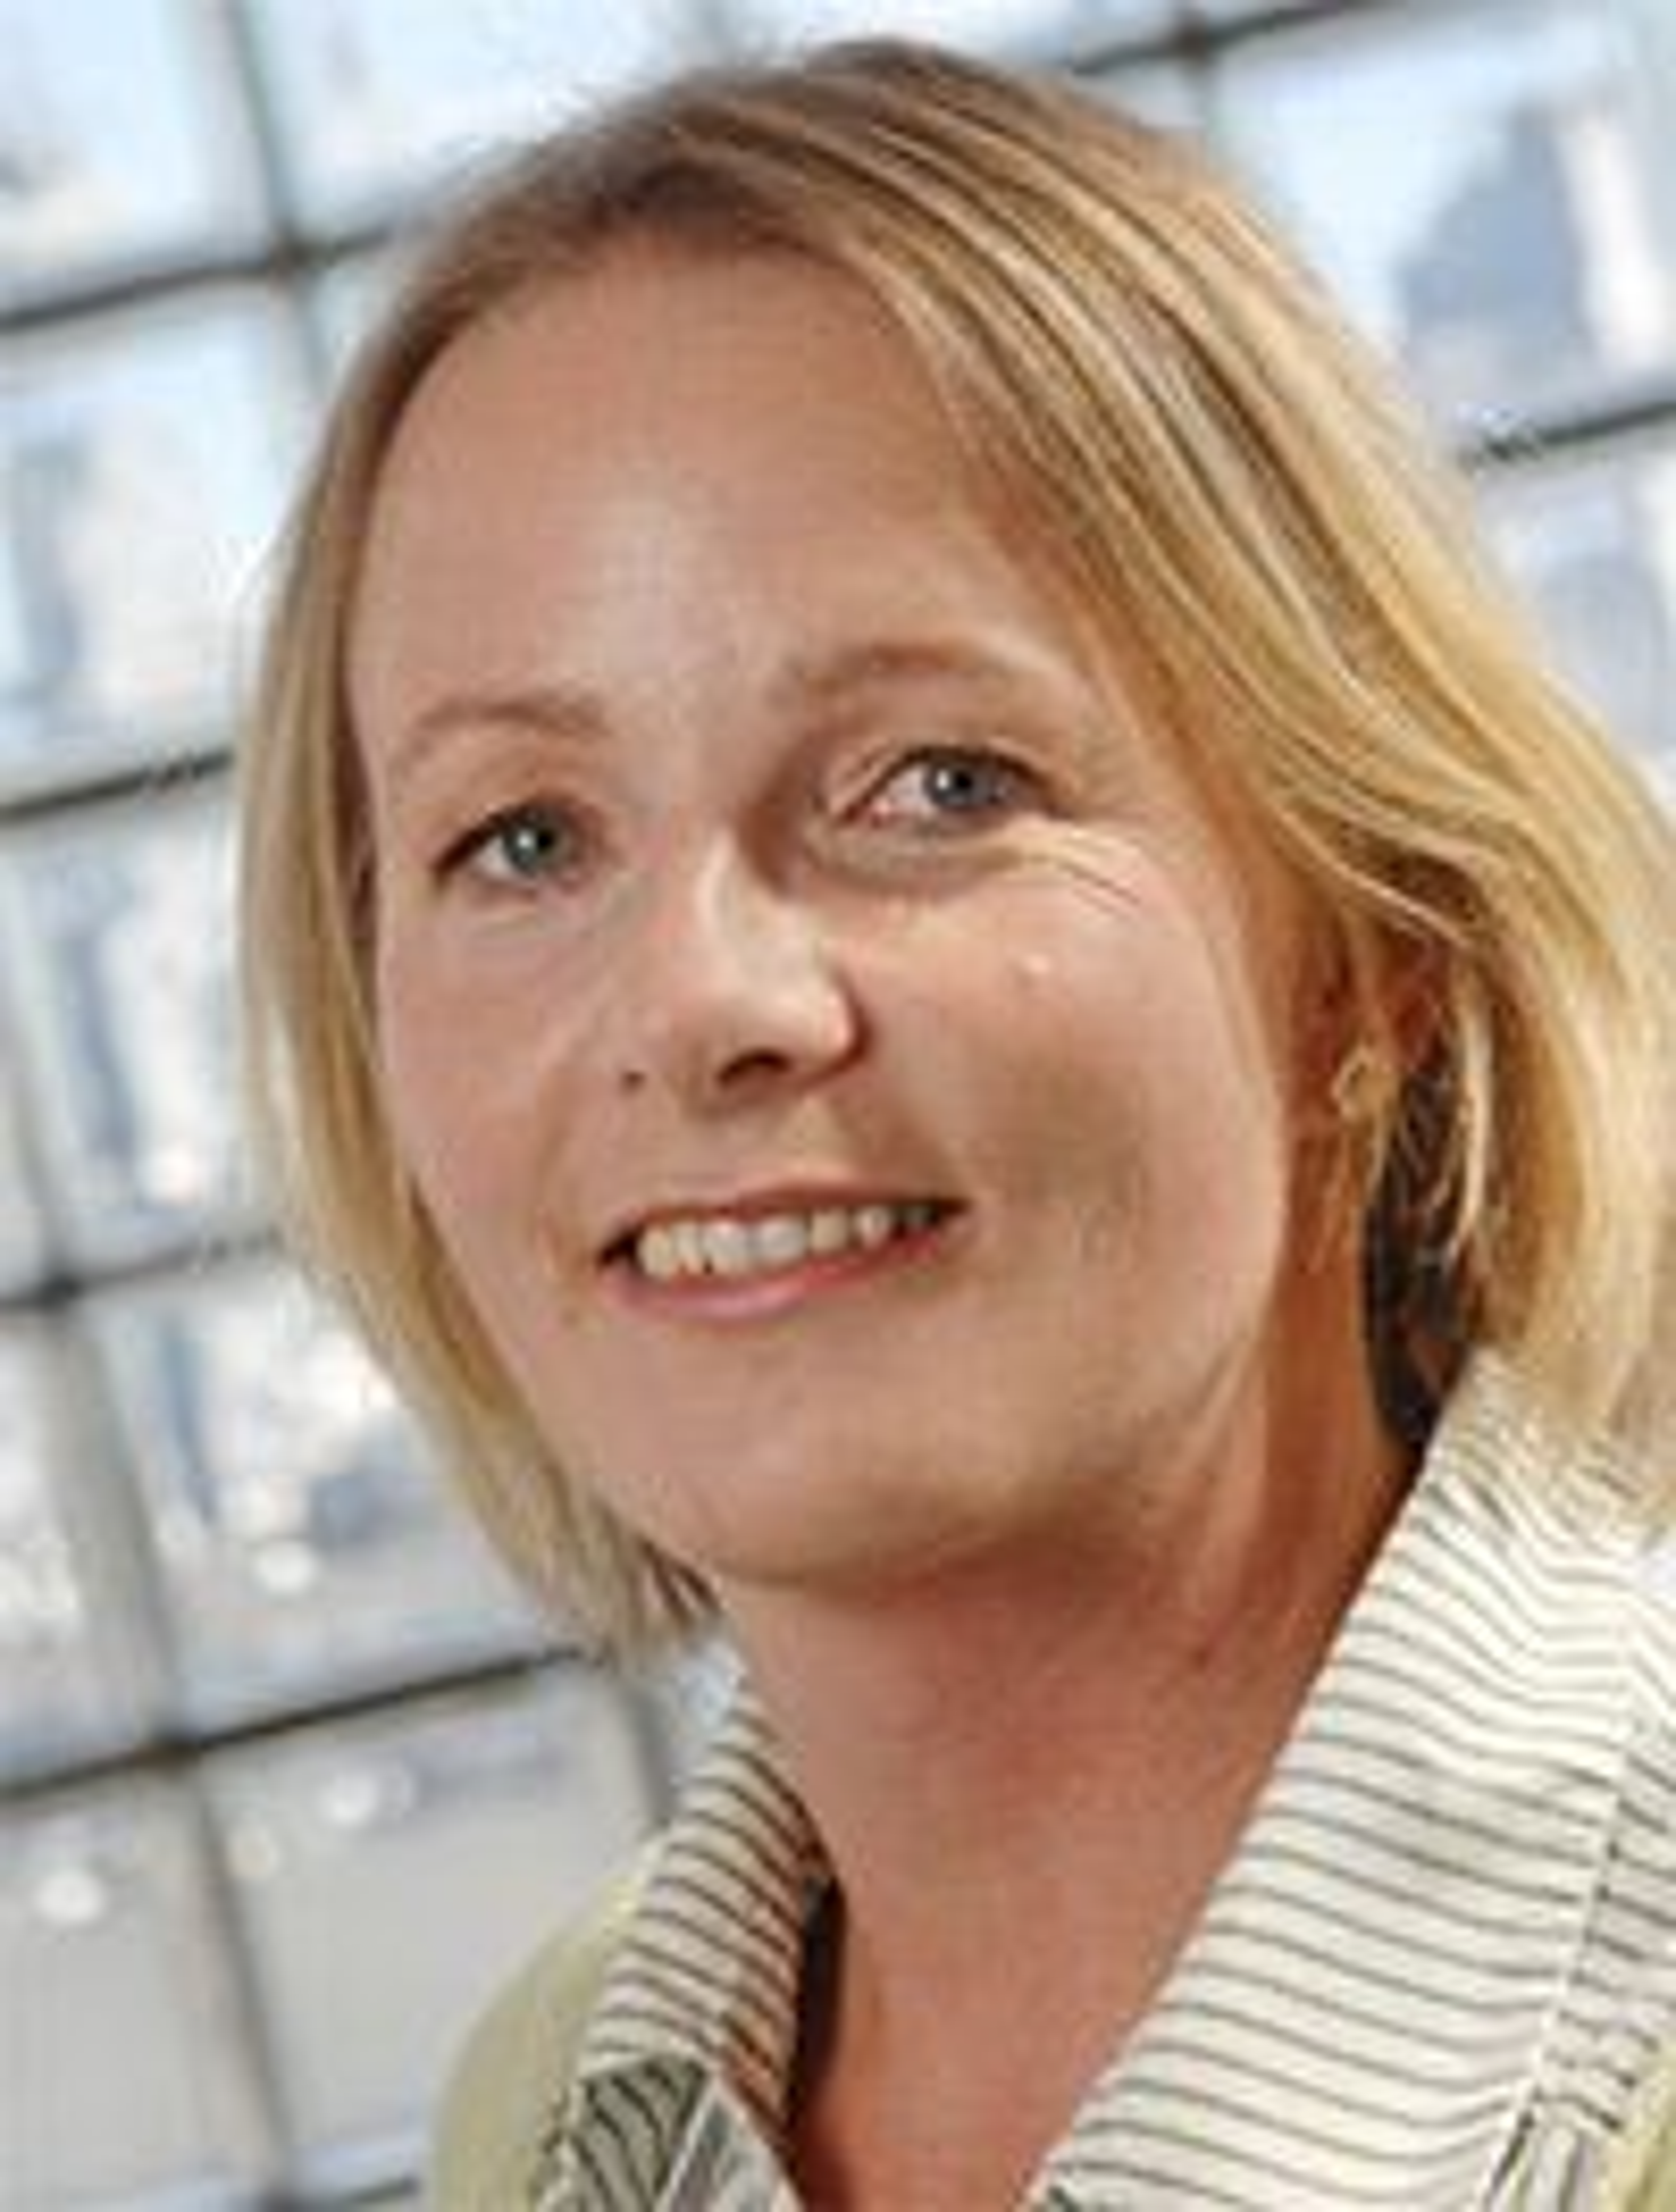 Ingrid Di Valerio, Teknas hovedtillitsvalgt i Statoil.